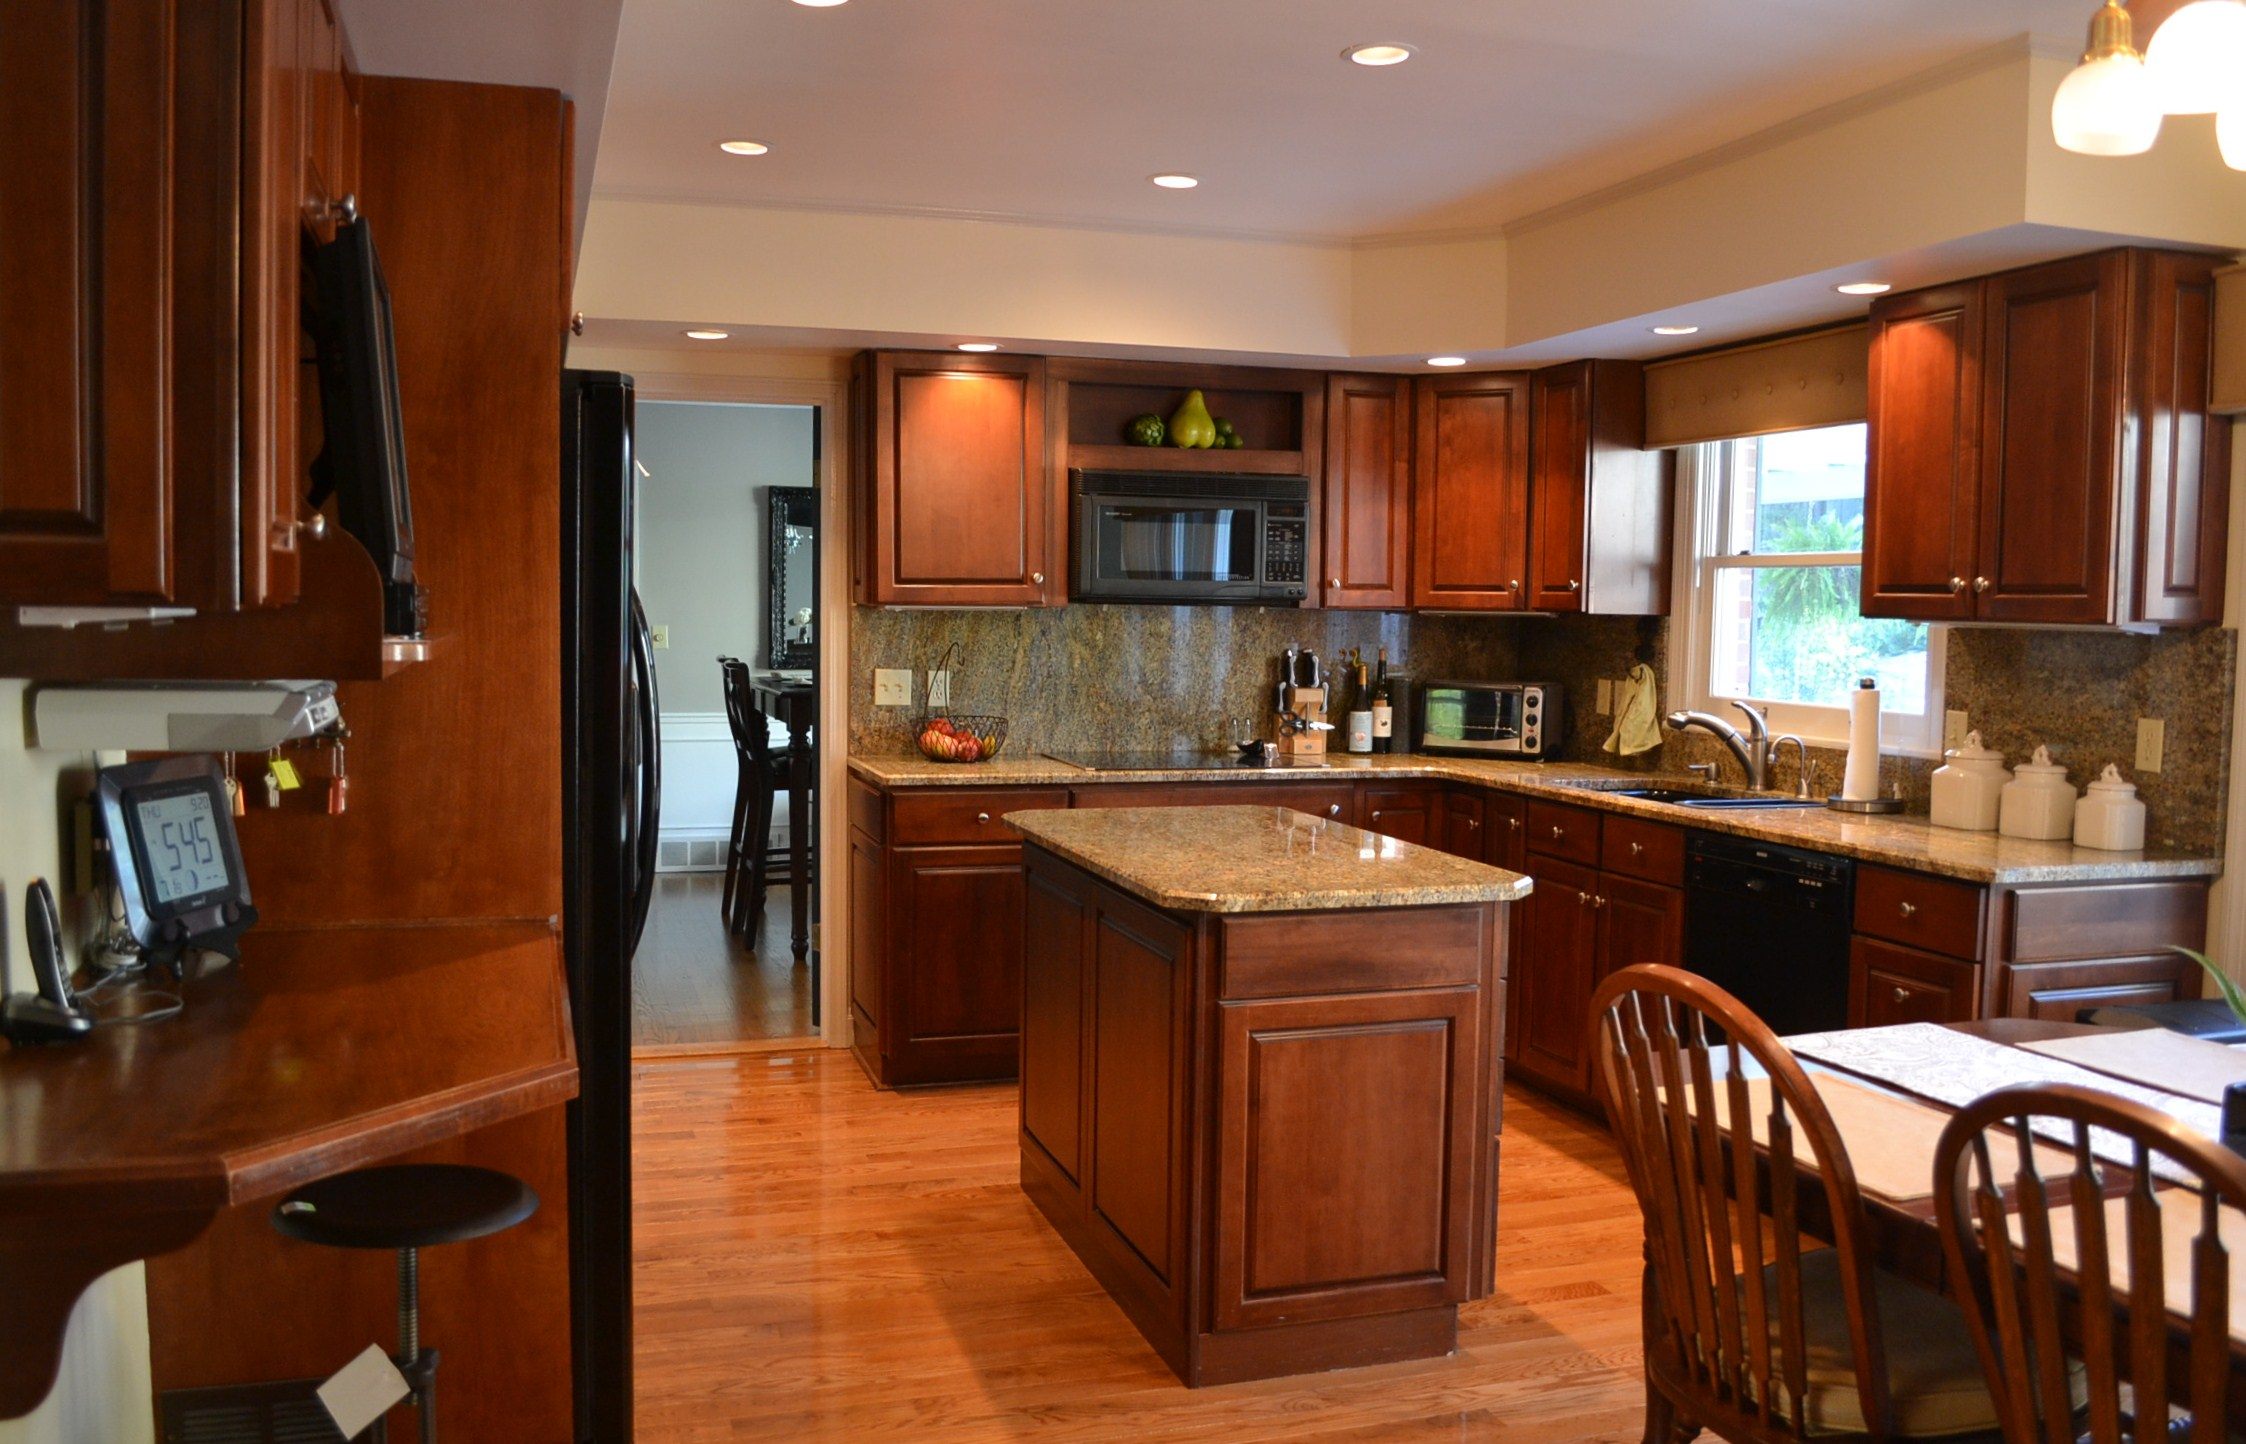 10 day kitchen makeover part i for Royal mahogany kitchen designs